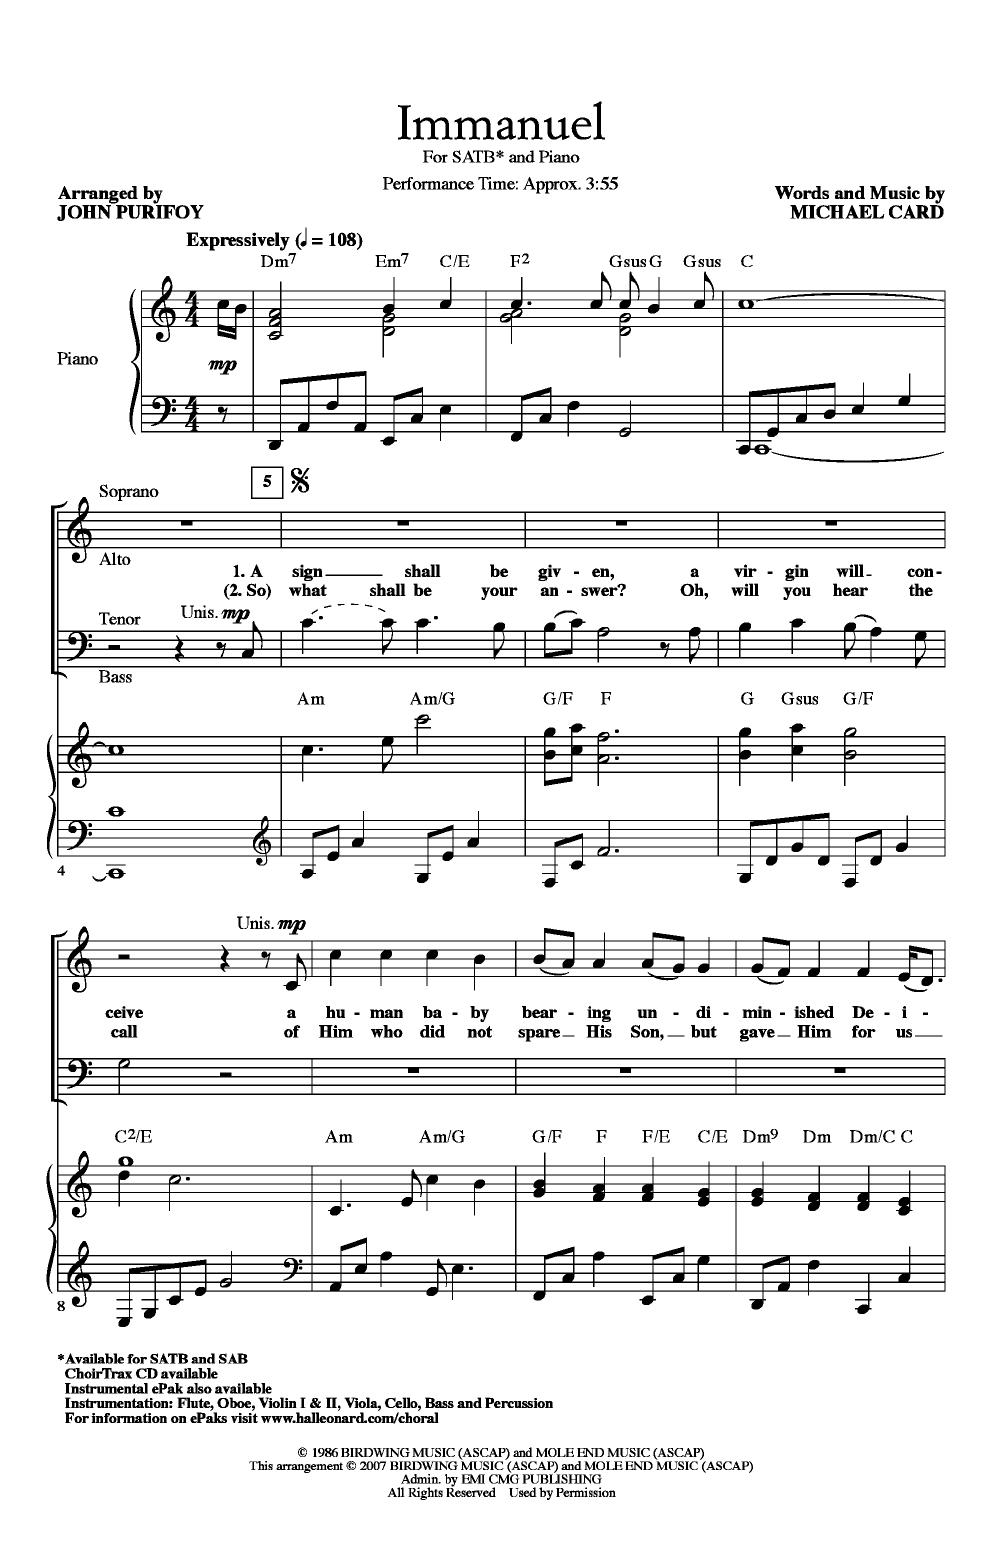 Immanuel Satb Arr John Purifoy Choral Sheet Music Immanuel Sheet Music